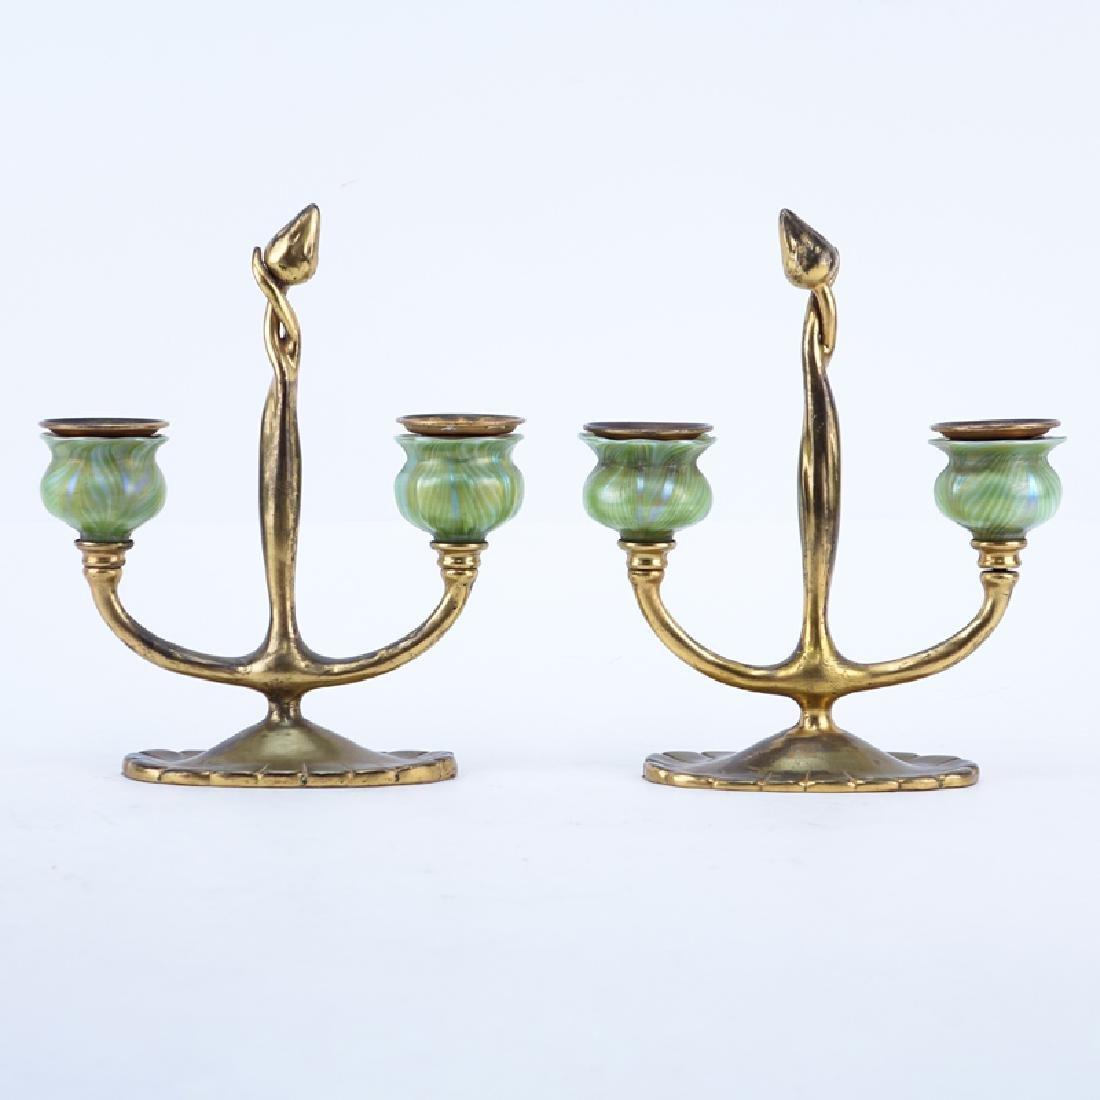 Pair of Tiffany Studios New York, Gilt-Bronze Two Light